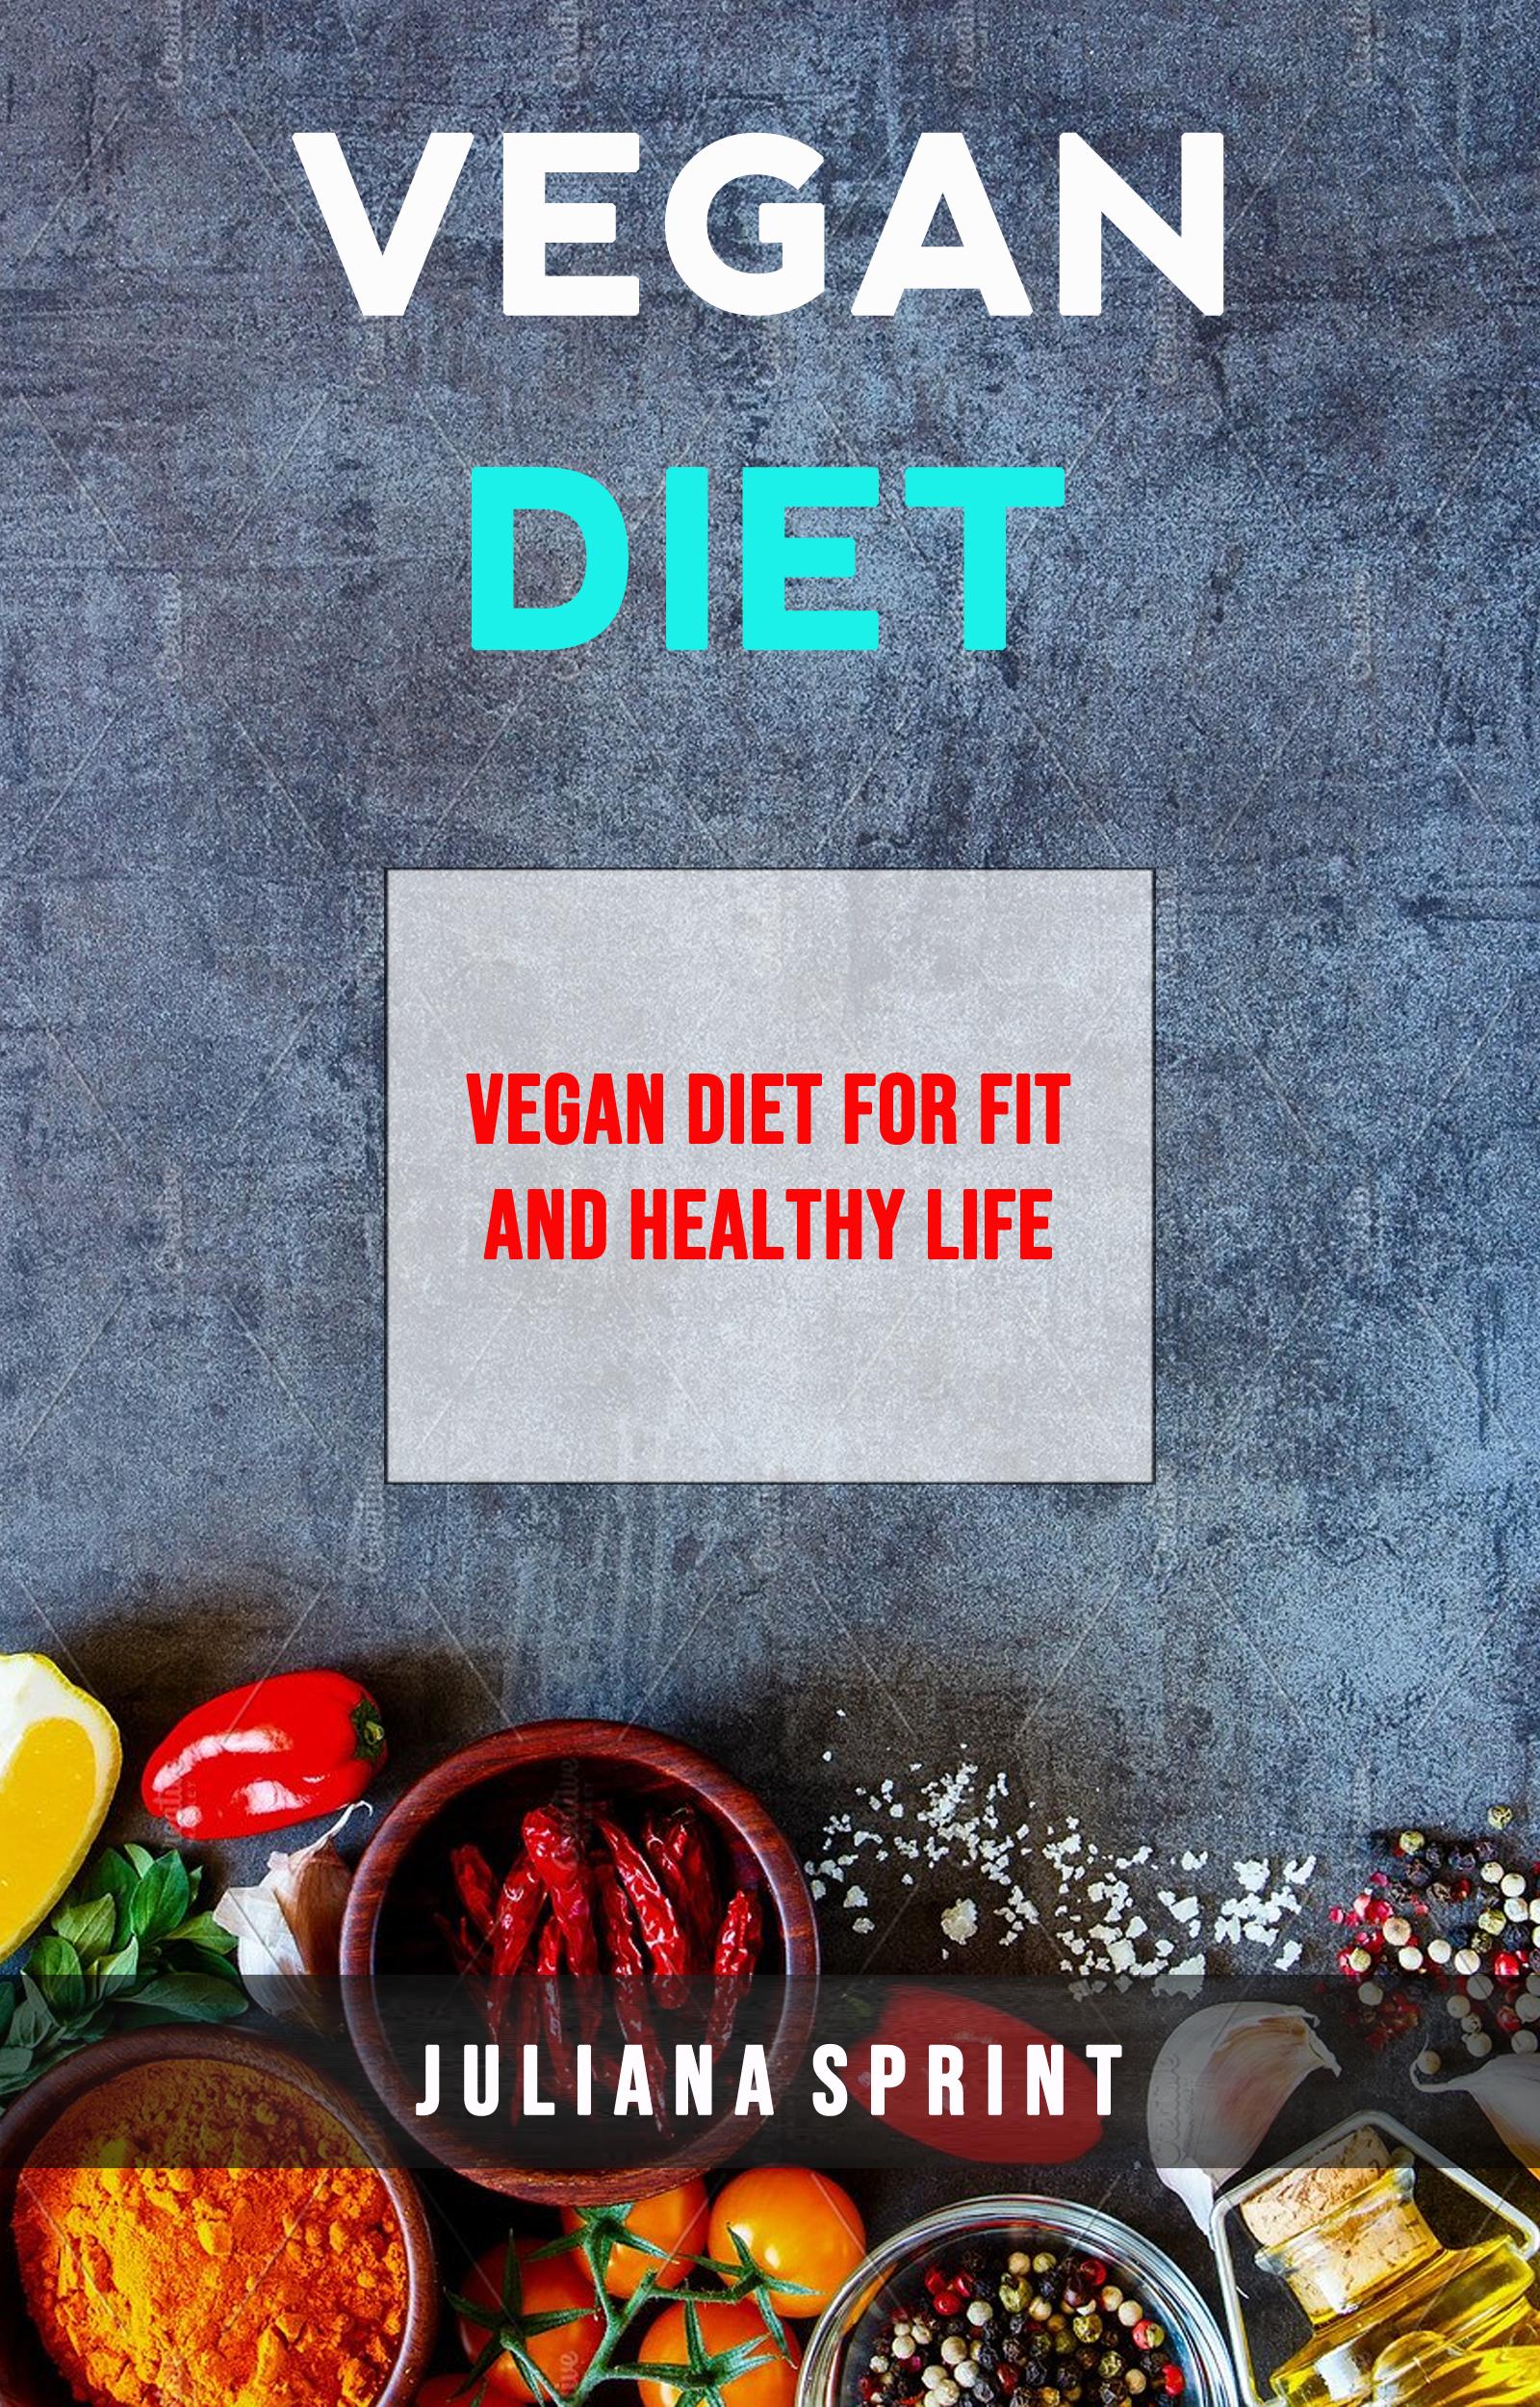 Vegan diet: vegan diet for fit and healthy life